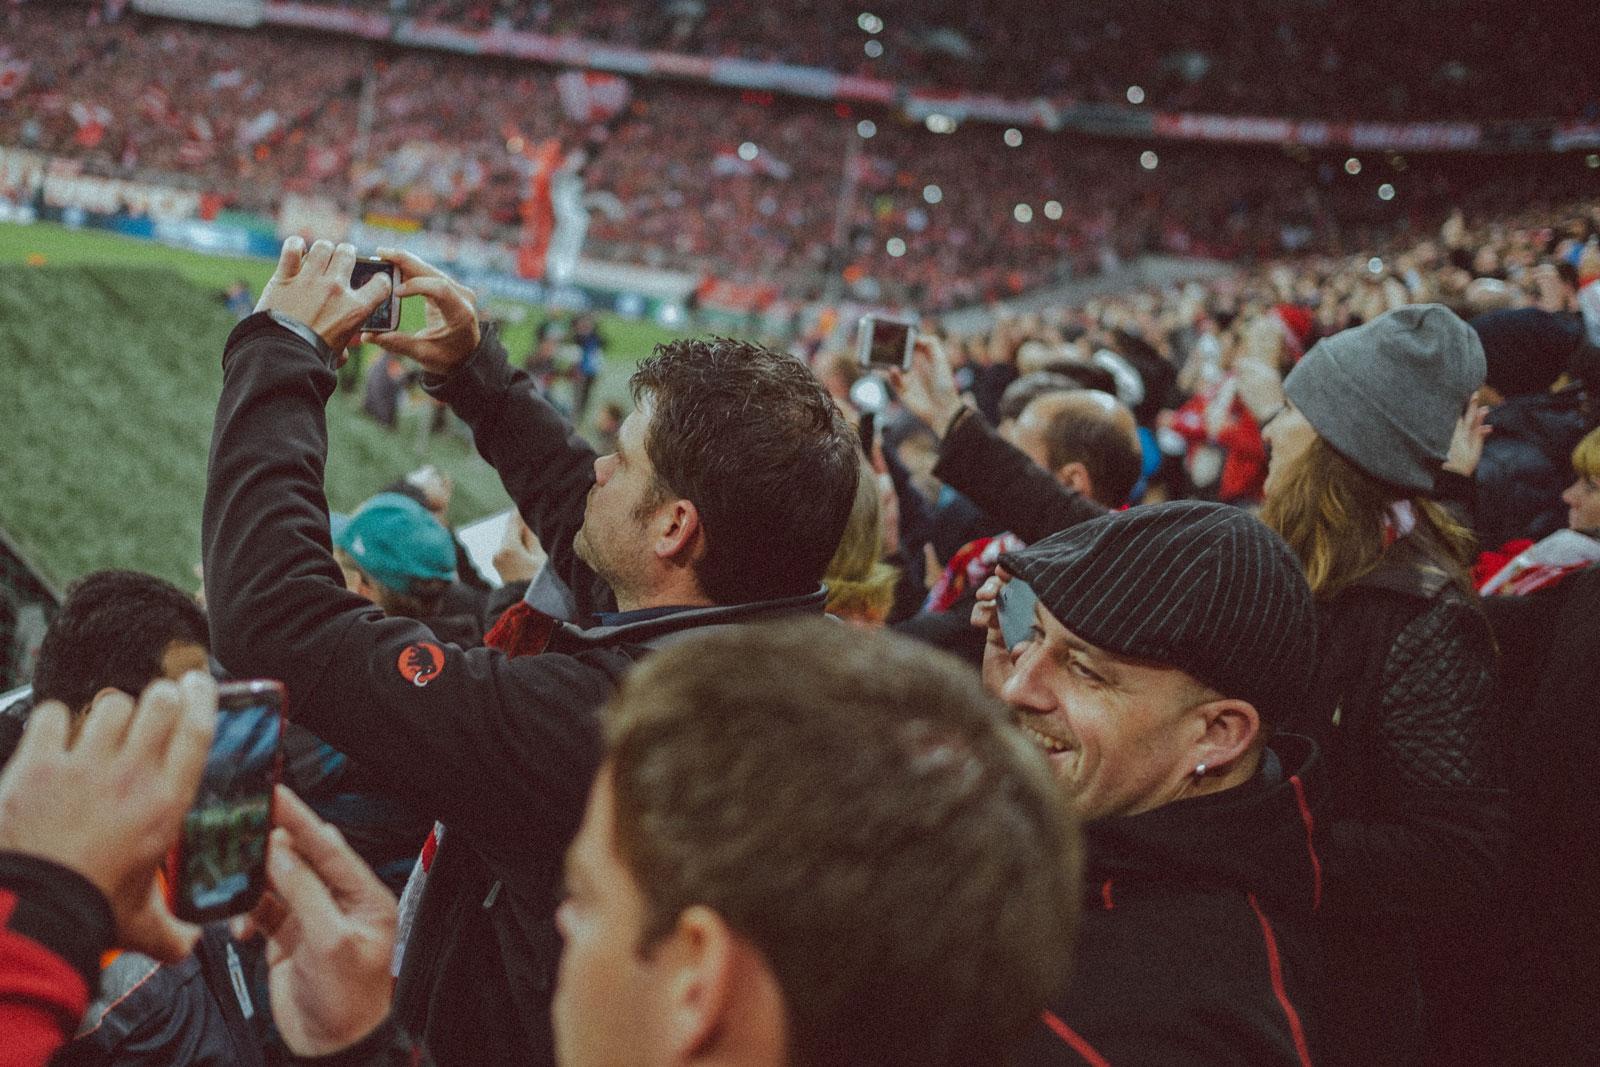 Pangea Football Case Study: Football connectivity